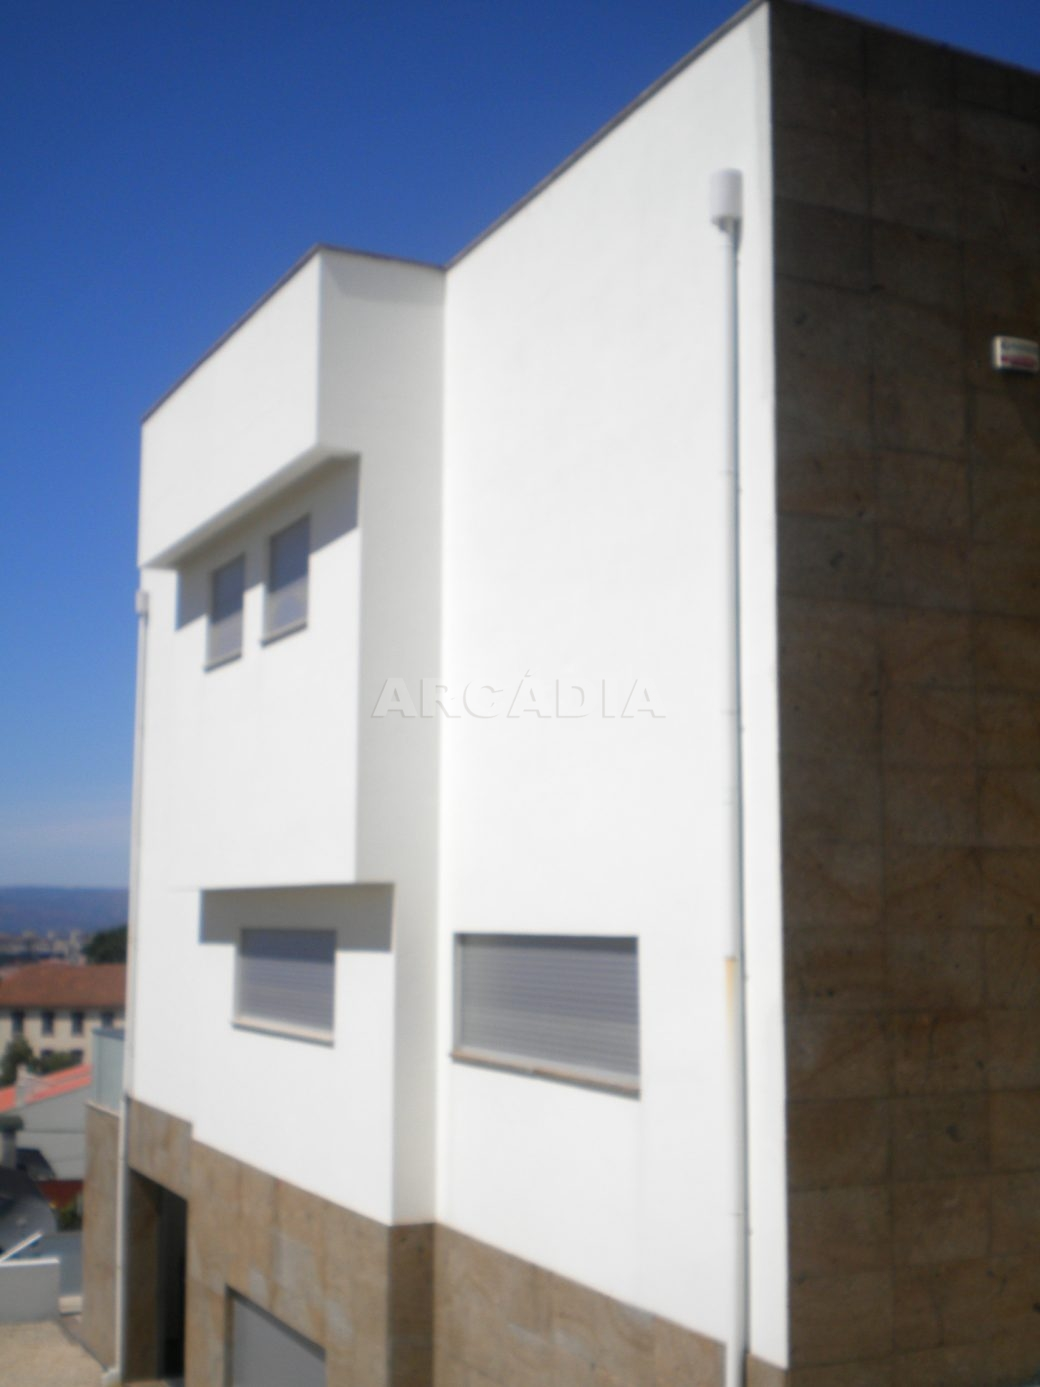 arcadia-imobiliaria-moradia-3665-532